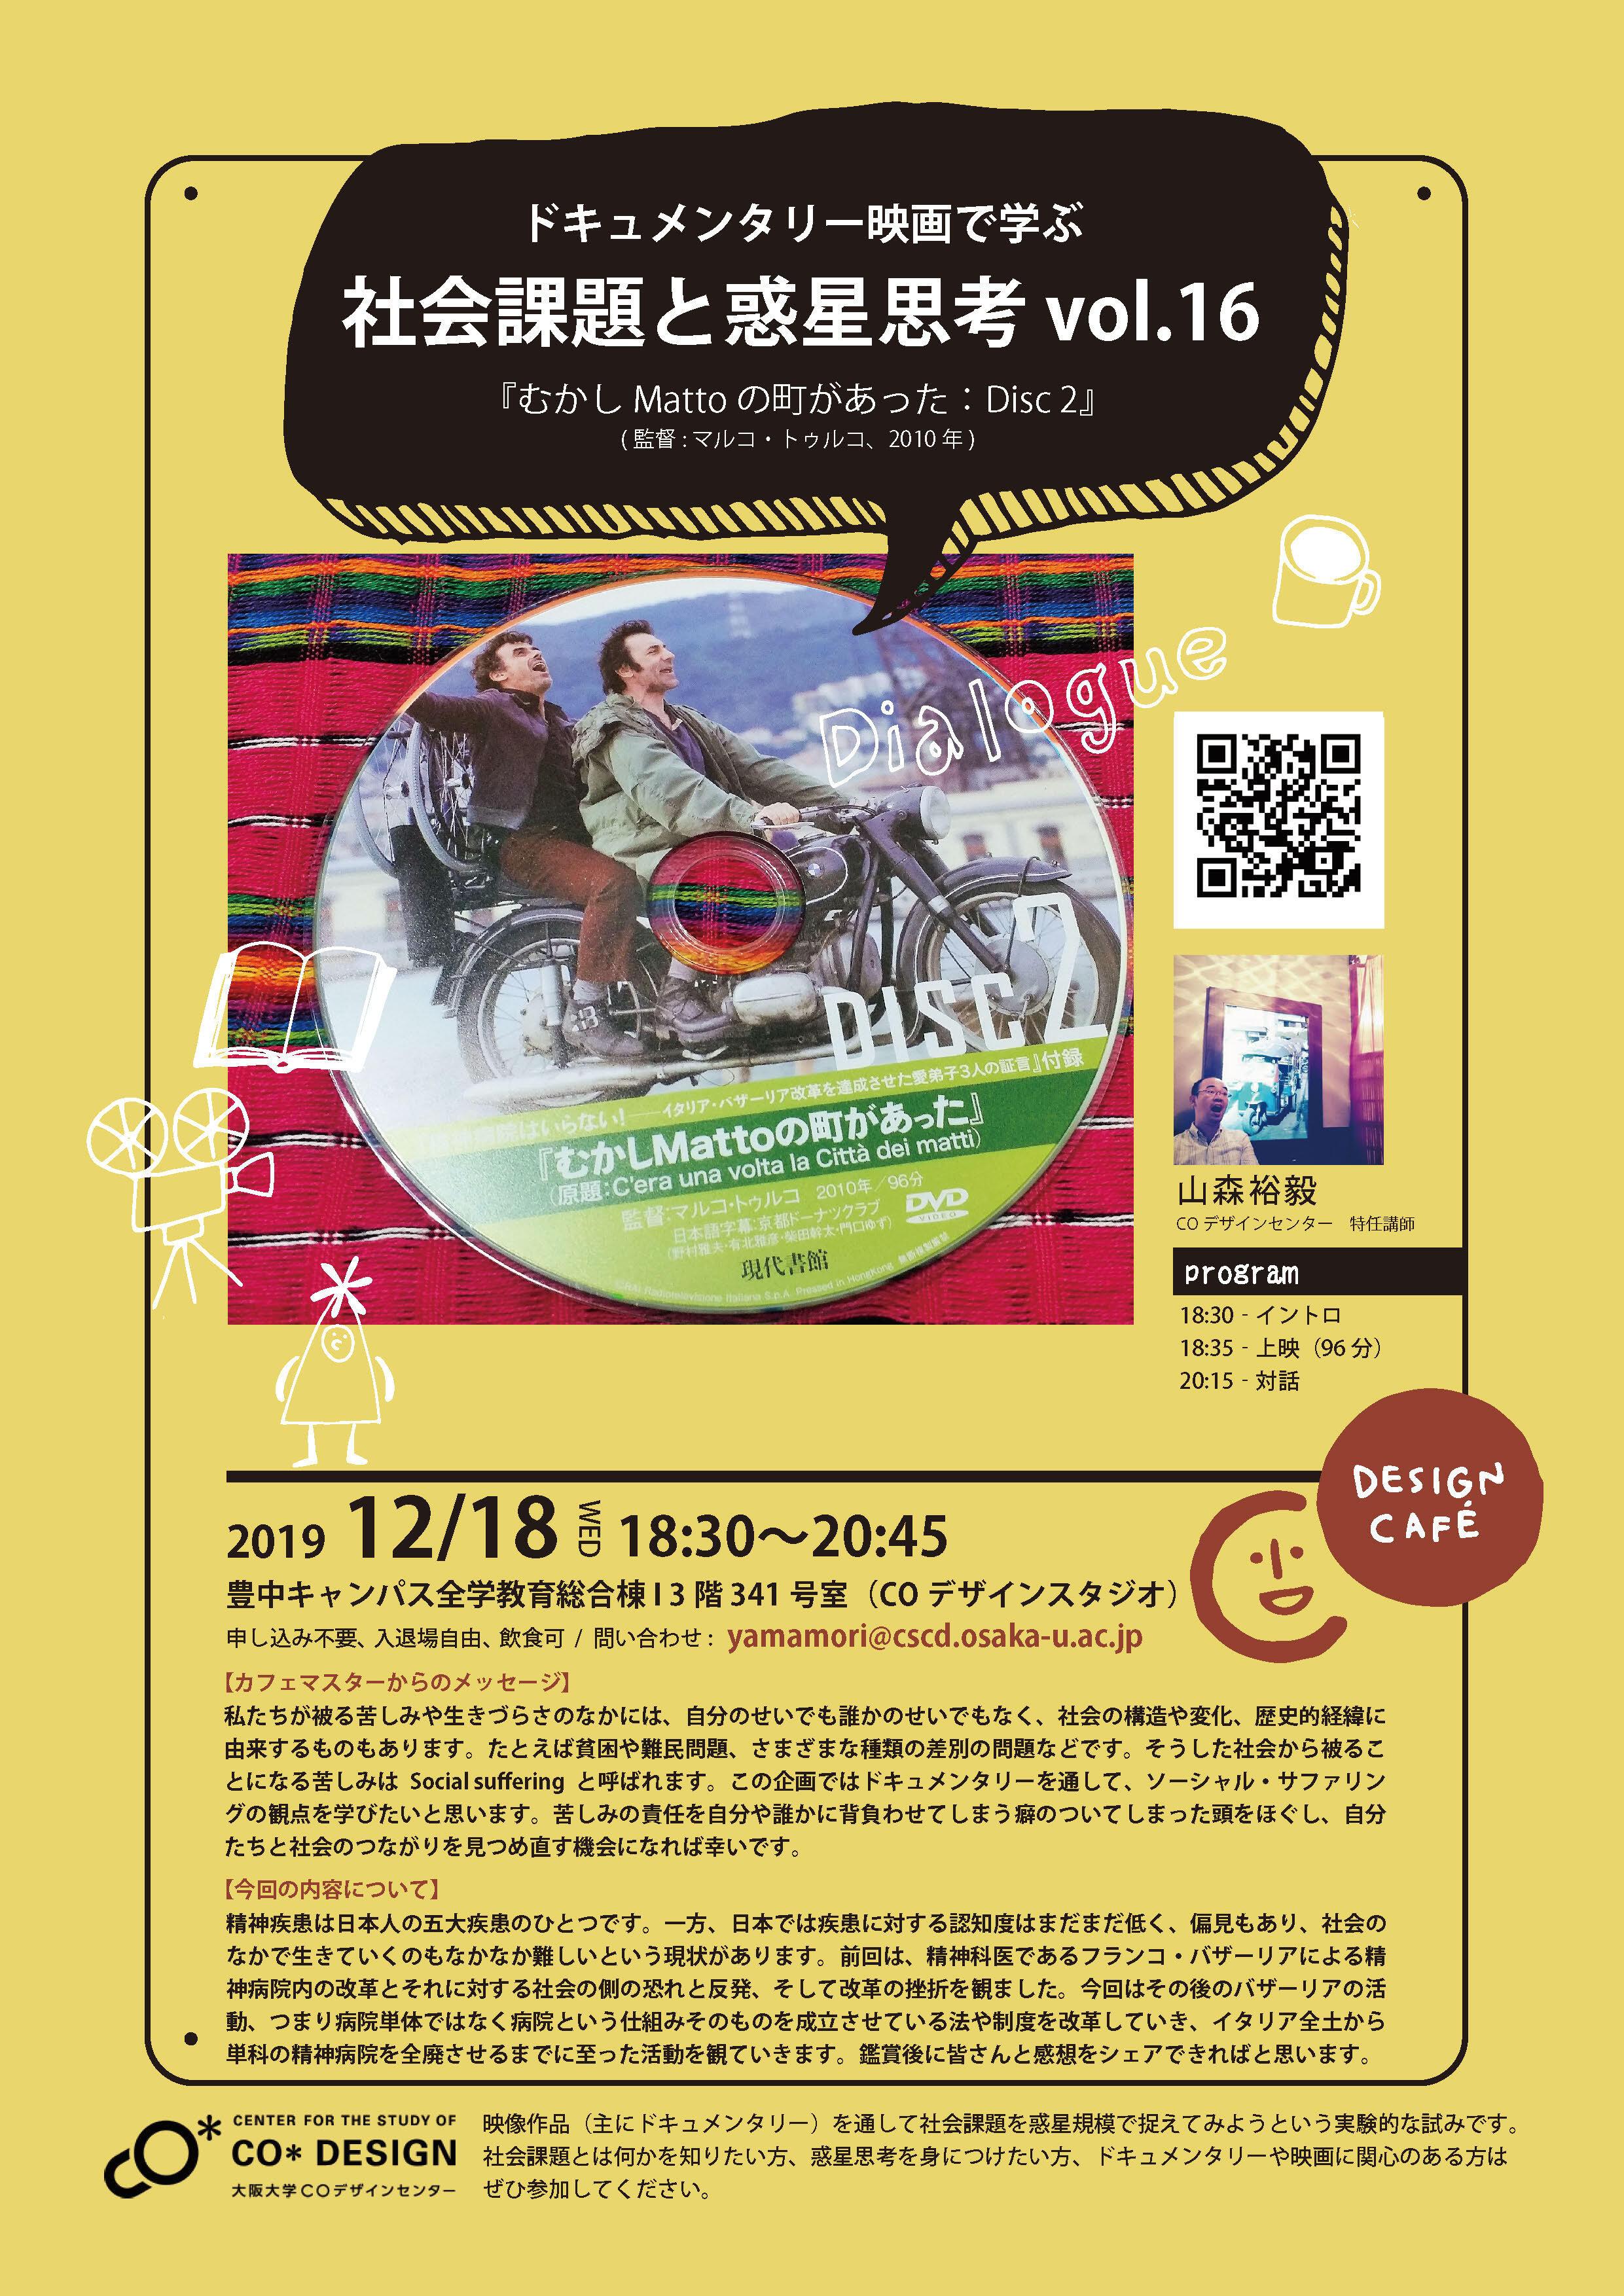 CO映画191130.jpg